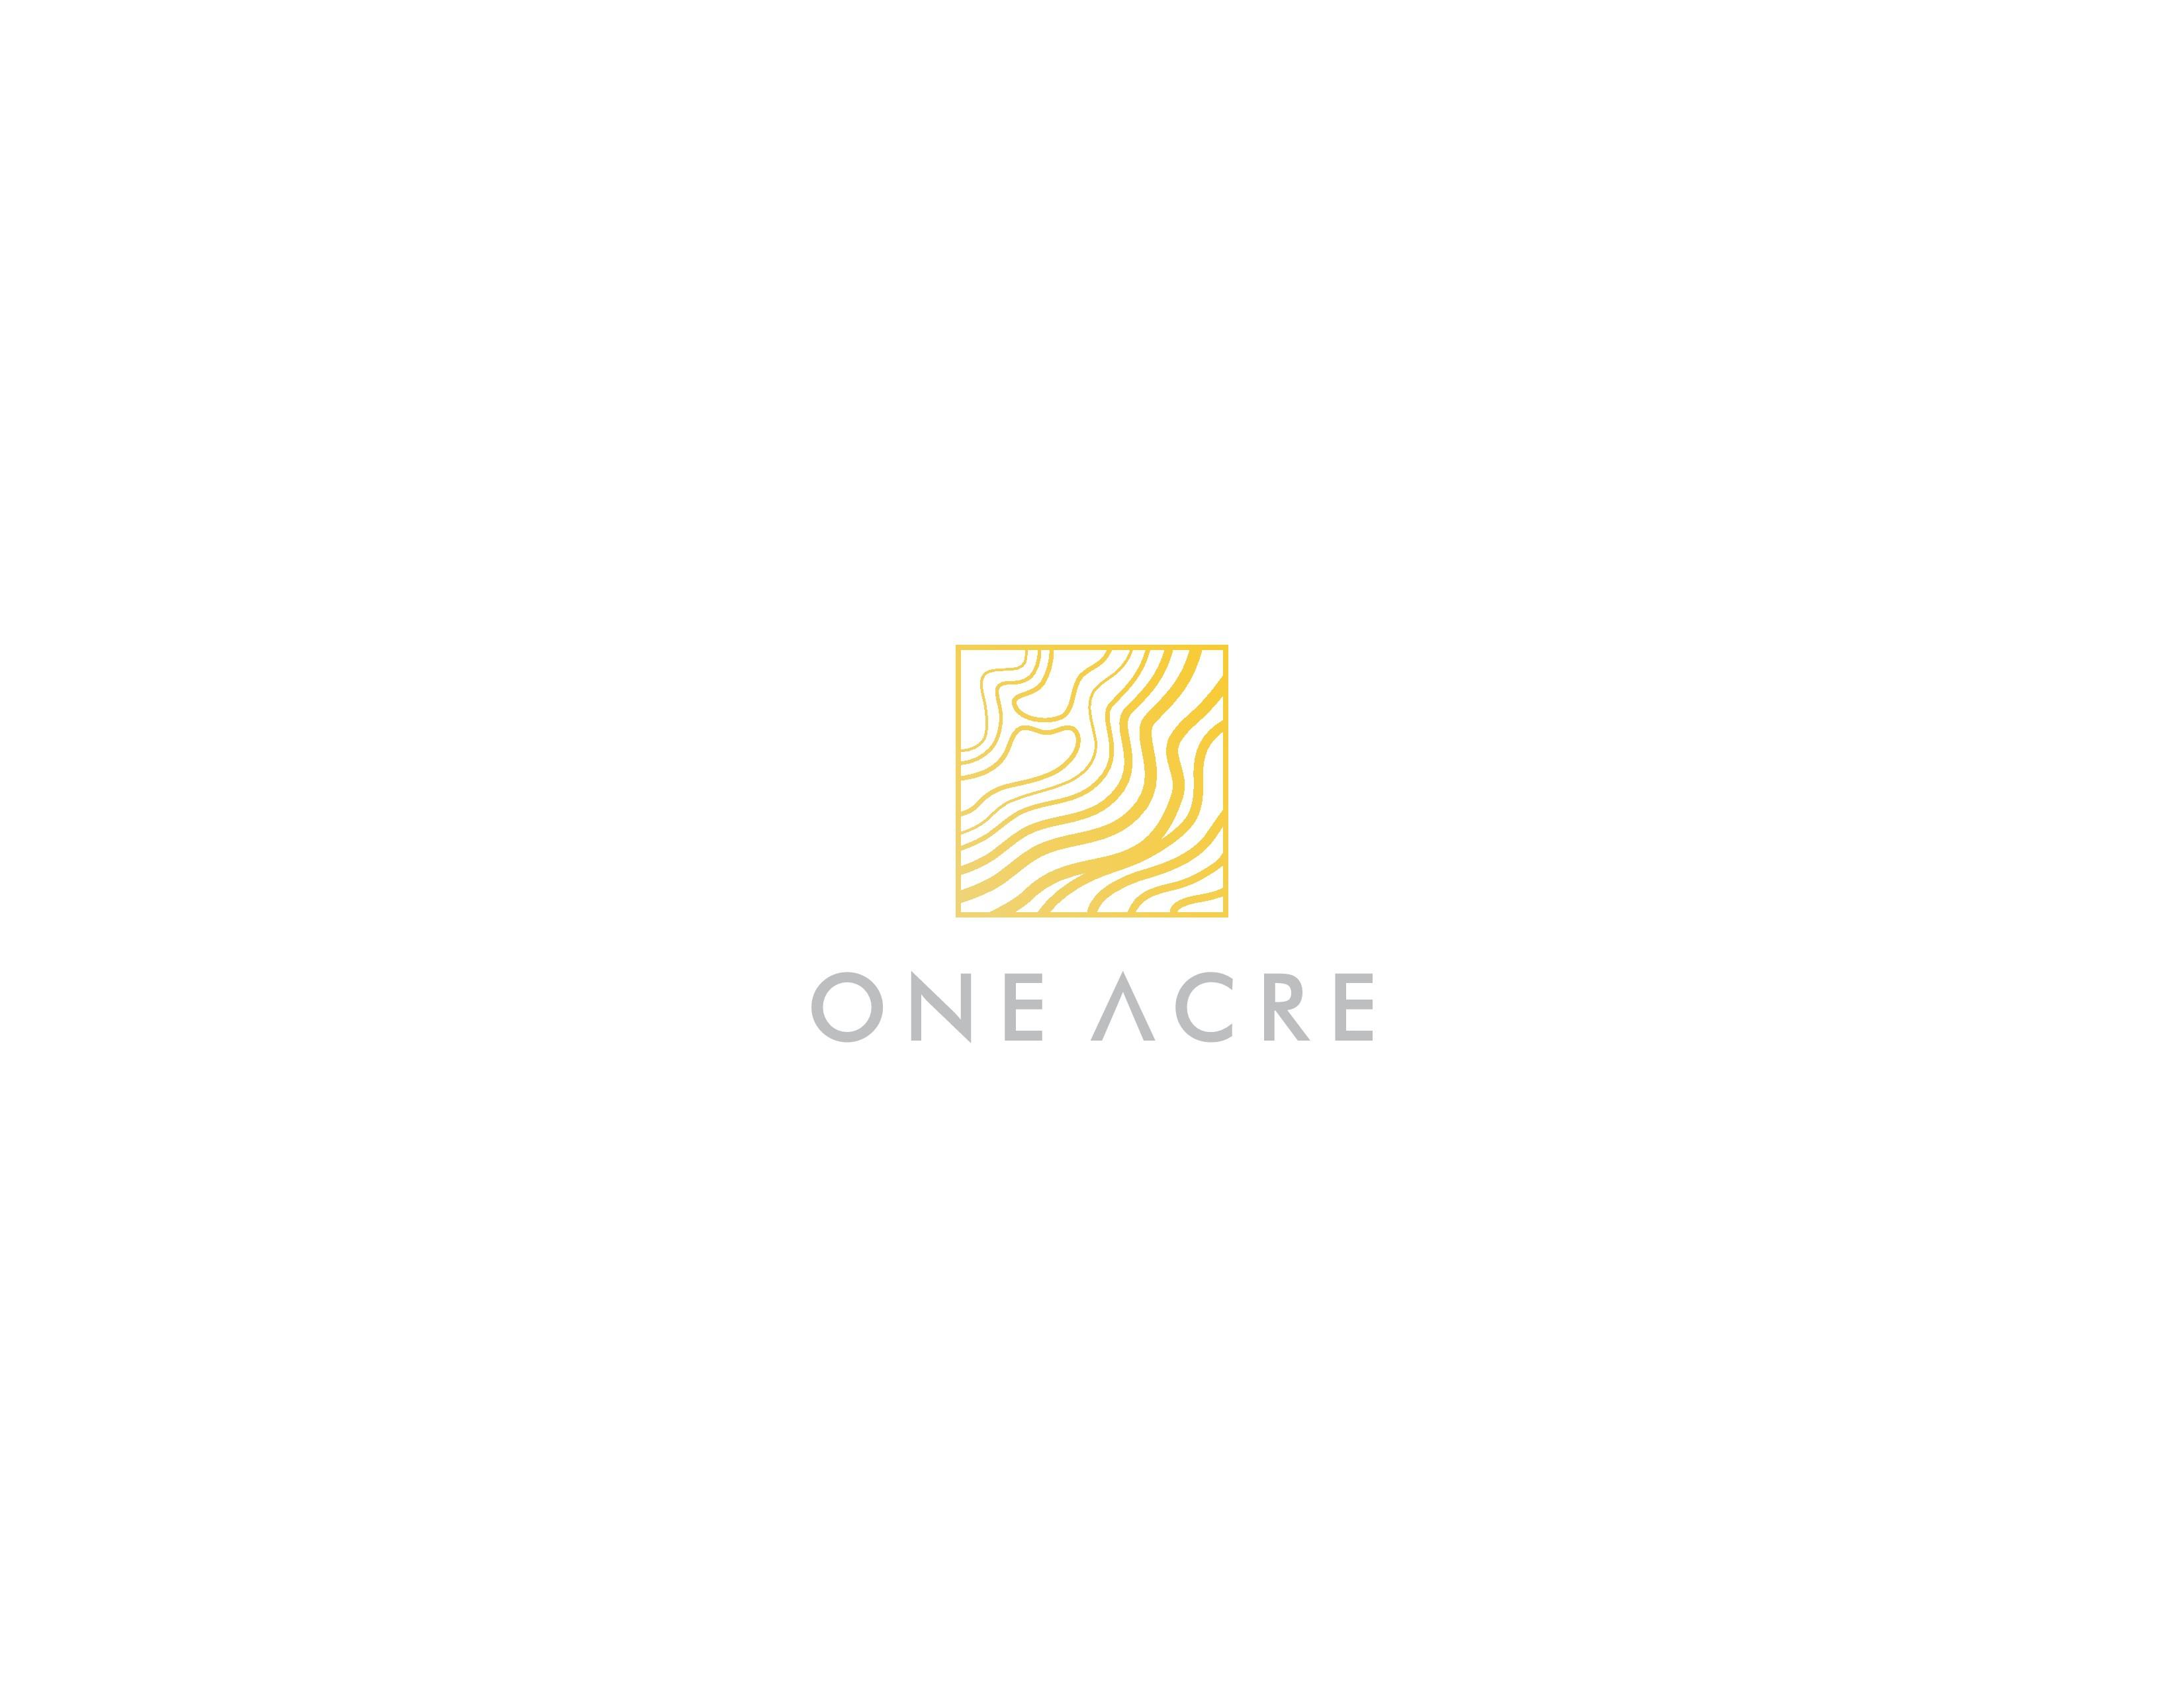 Design an original, creative, unique logo for startup commercial real estate firm